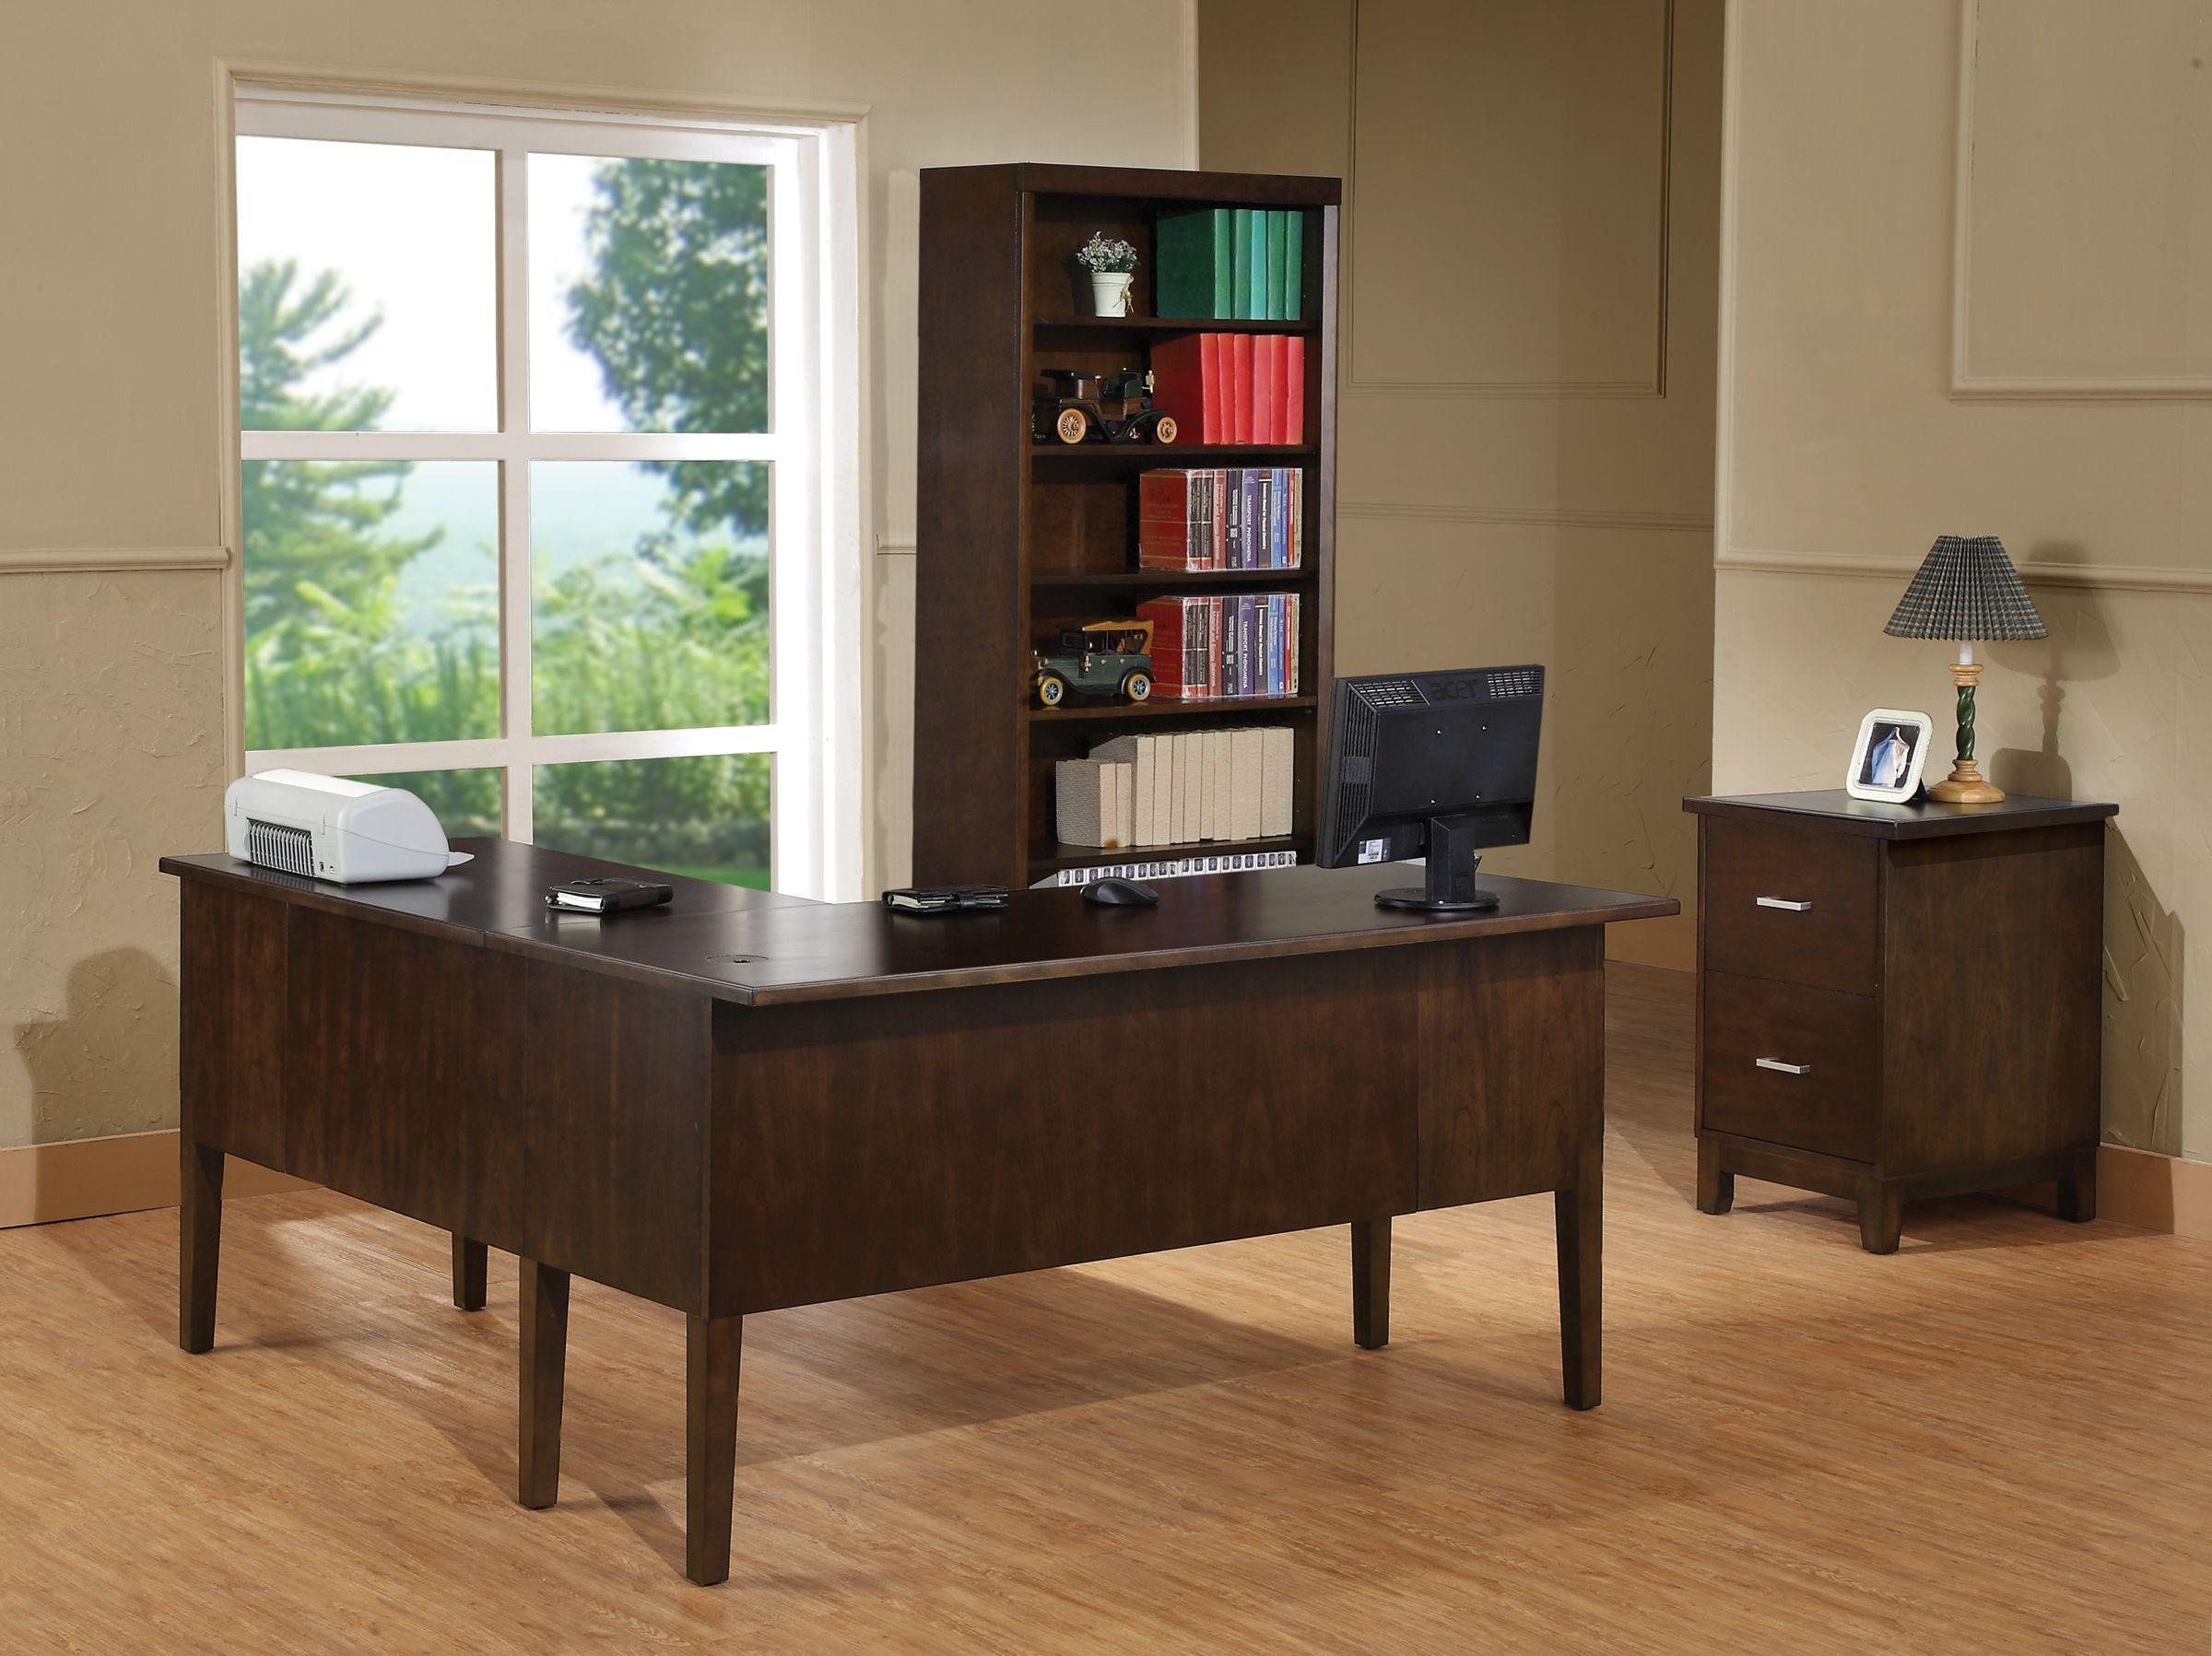 Concept L Shaped Computer Desk IKEA